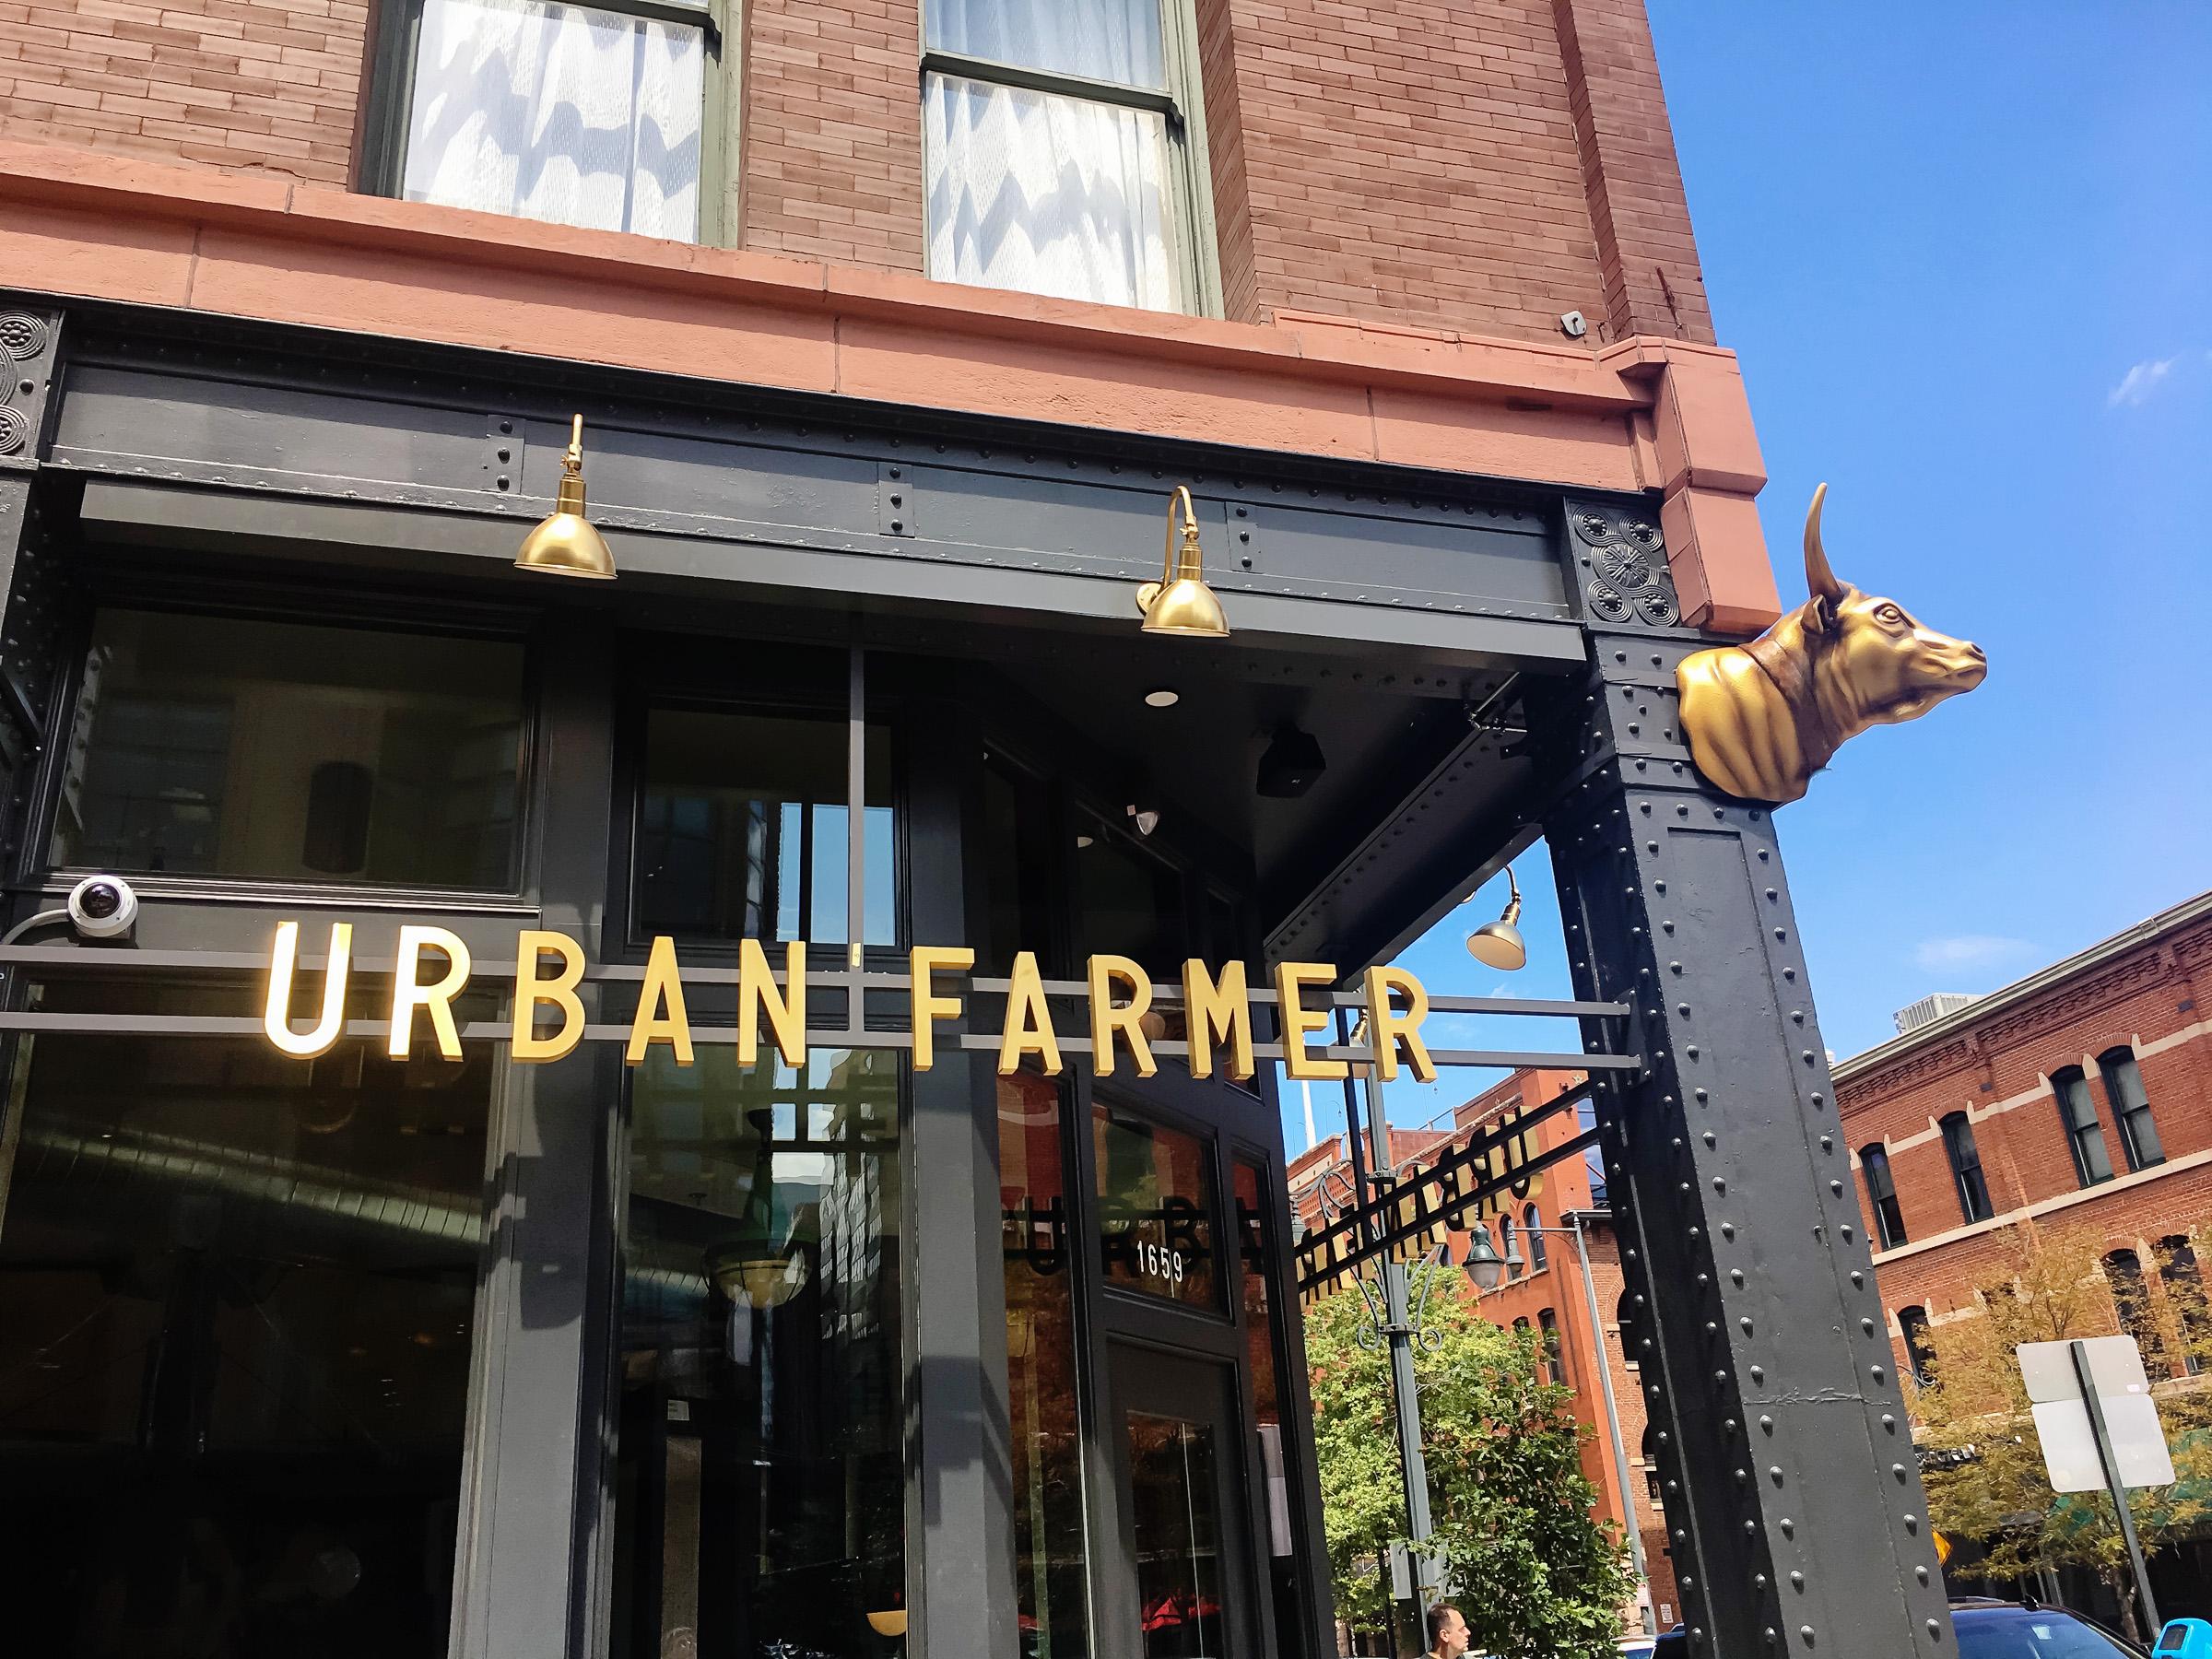 Urban Farmer1659 Wazee StreetDenver, CO 80202303.262.6070 -